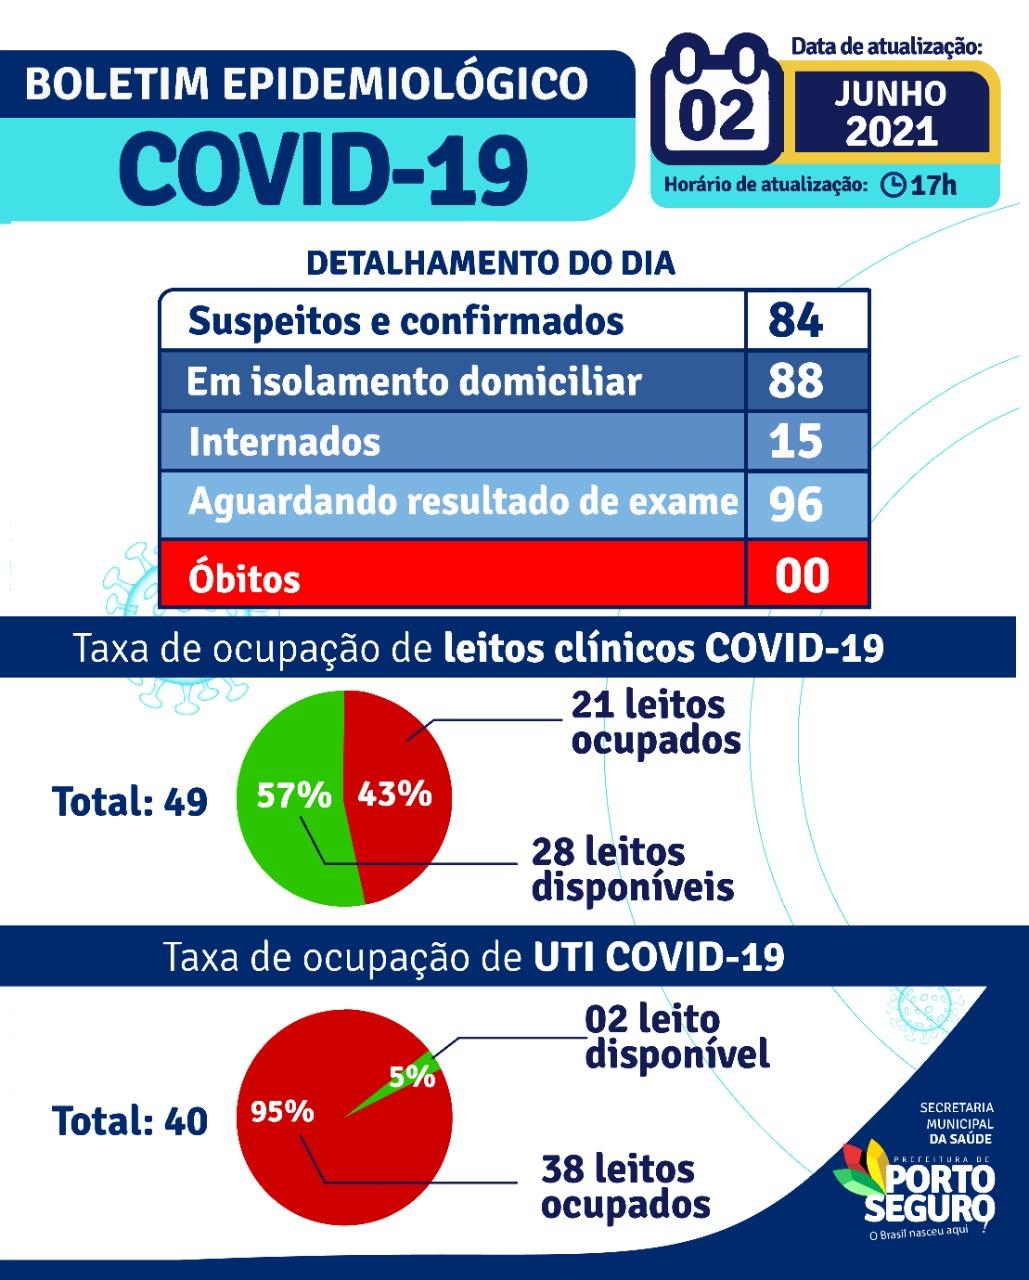 Porto Seguro: Boletim Epidemiológico Covid-19 (02/Junho) 22